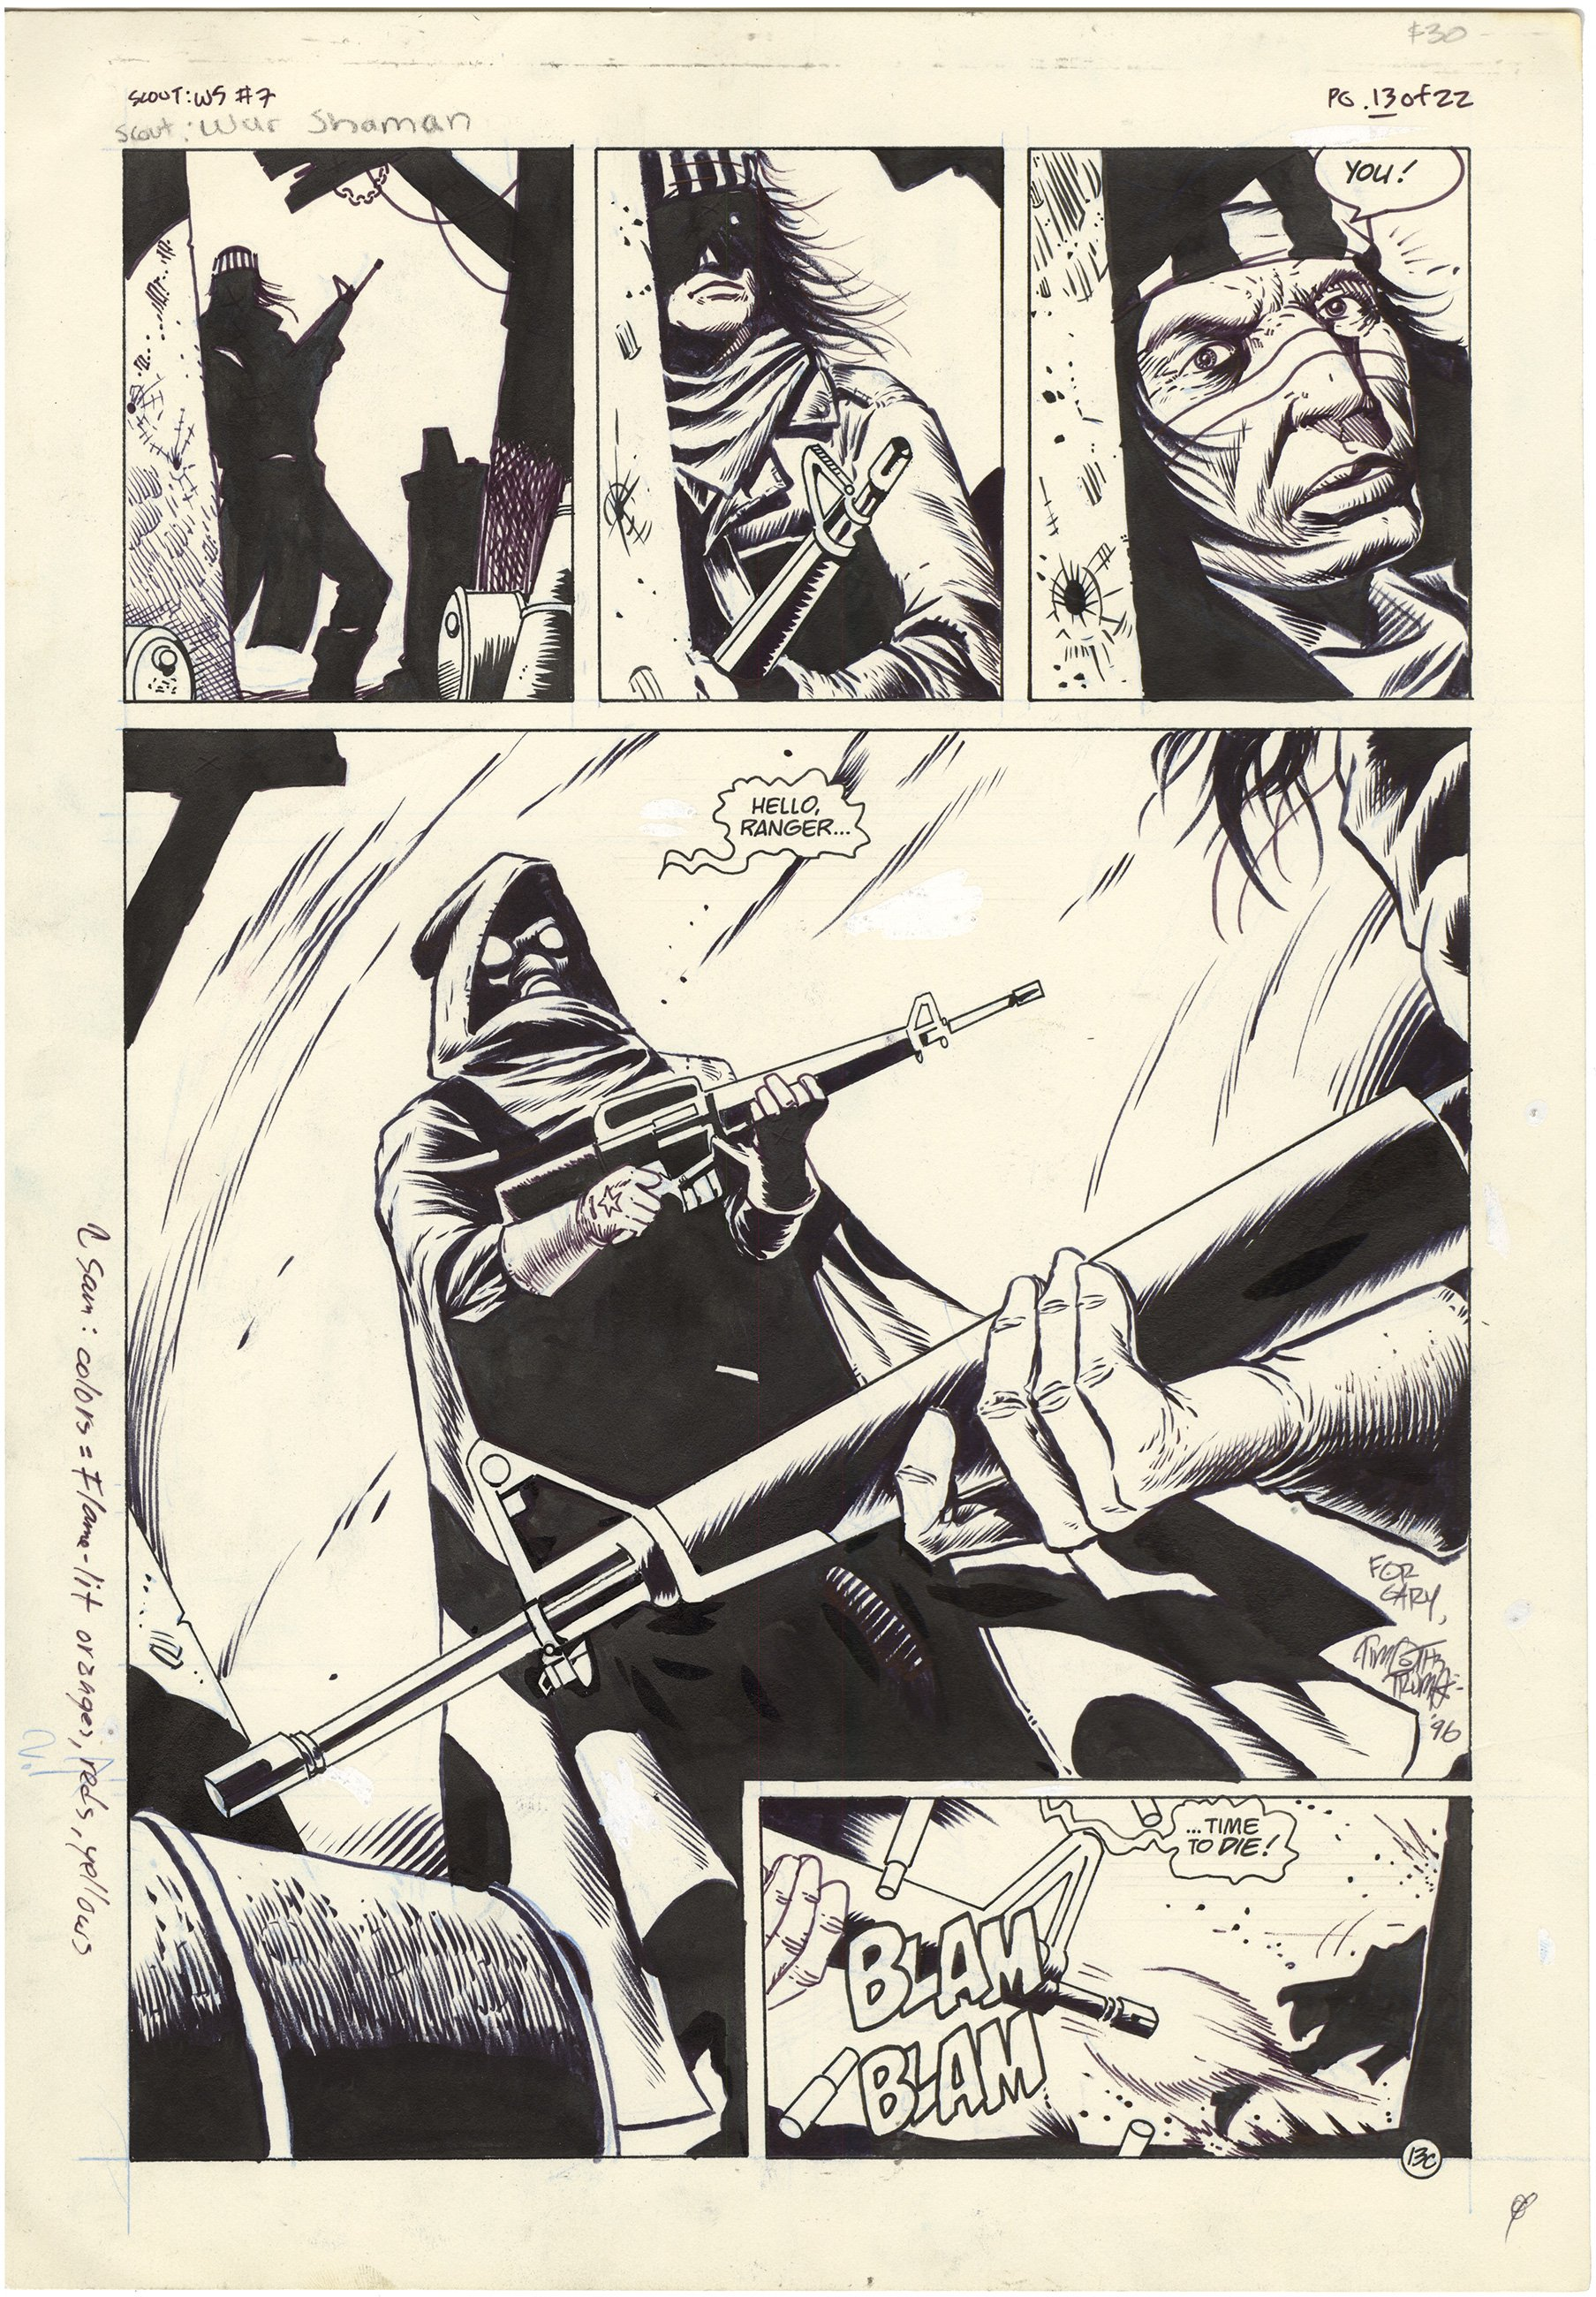 Scout: War Shaman #7 p13